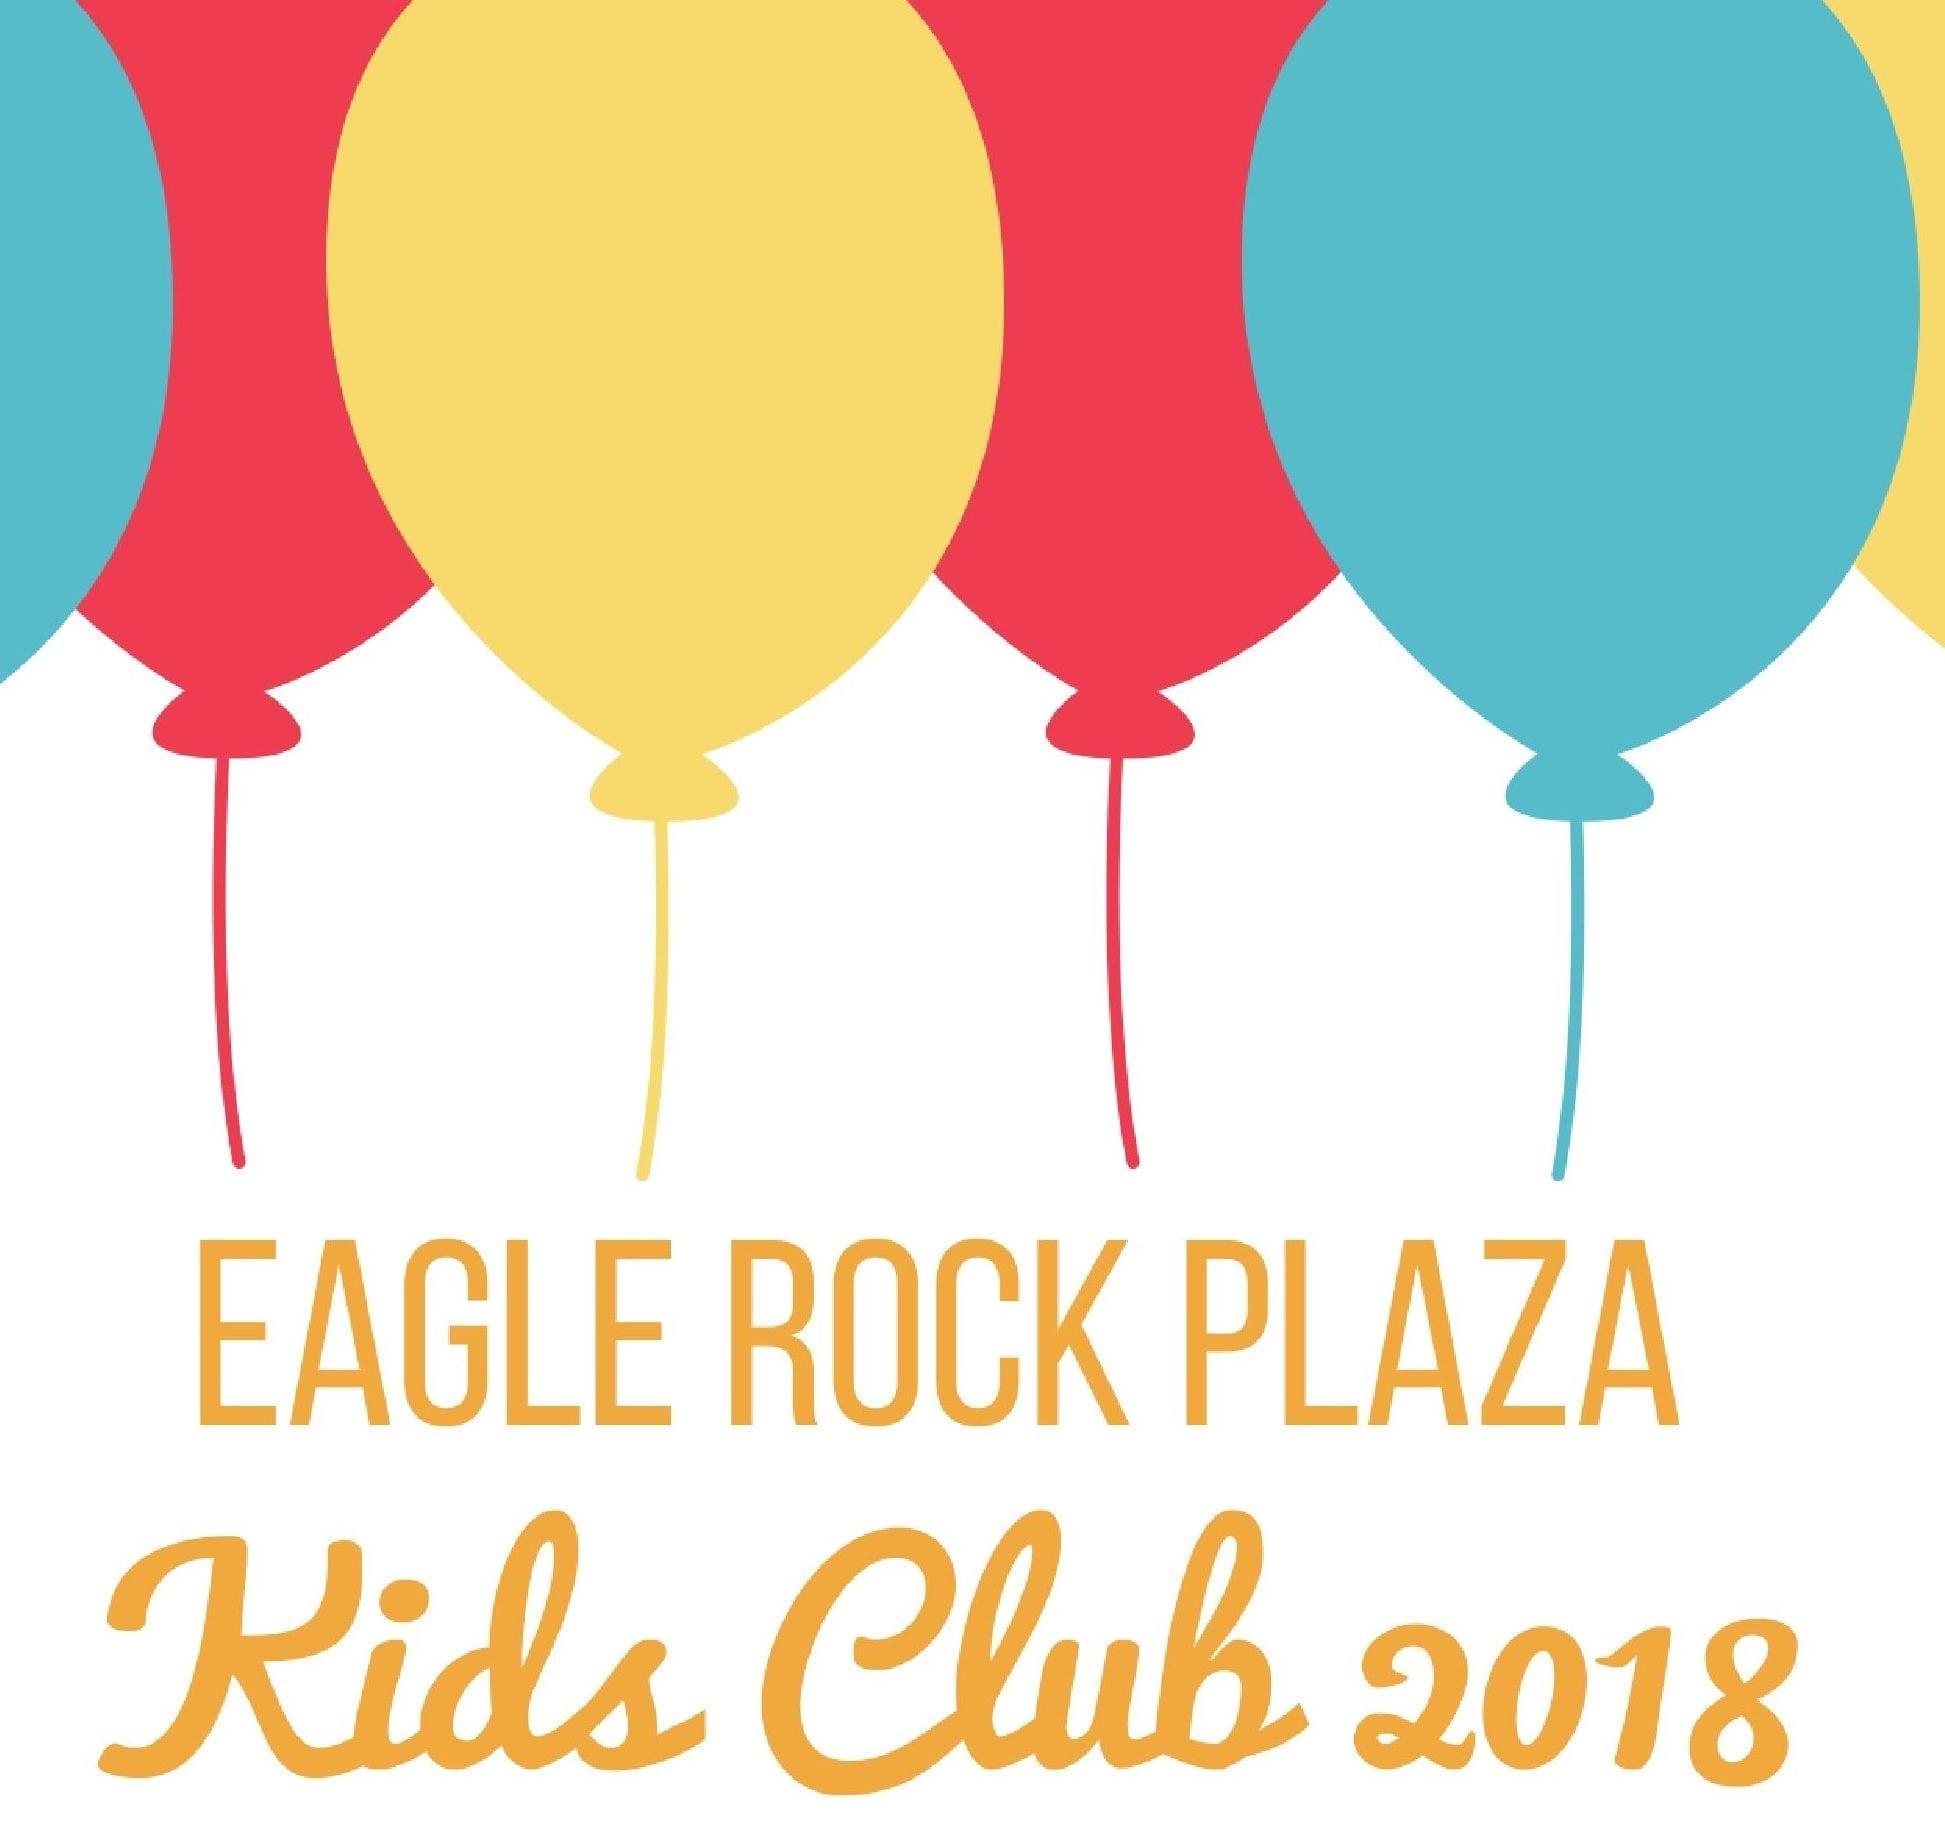 Eagle Rock Plaza Kids Club